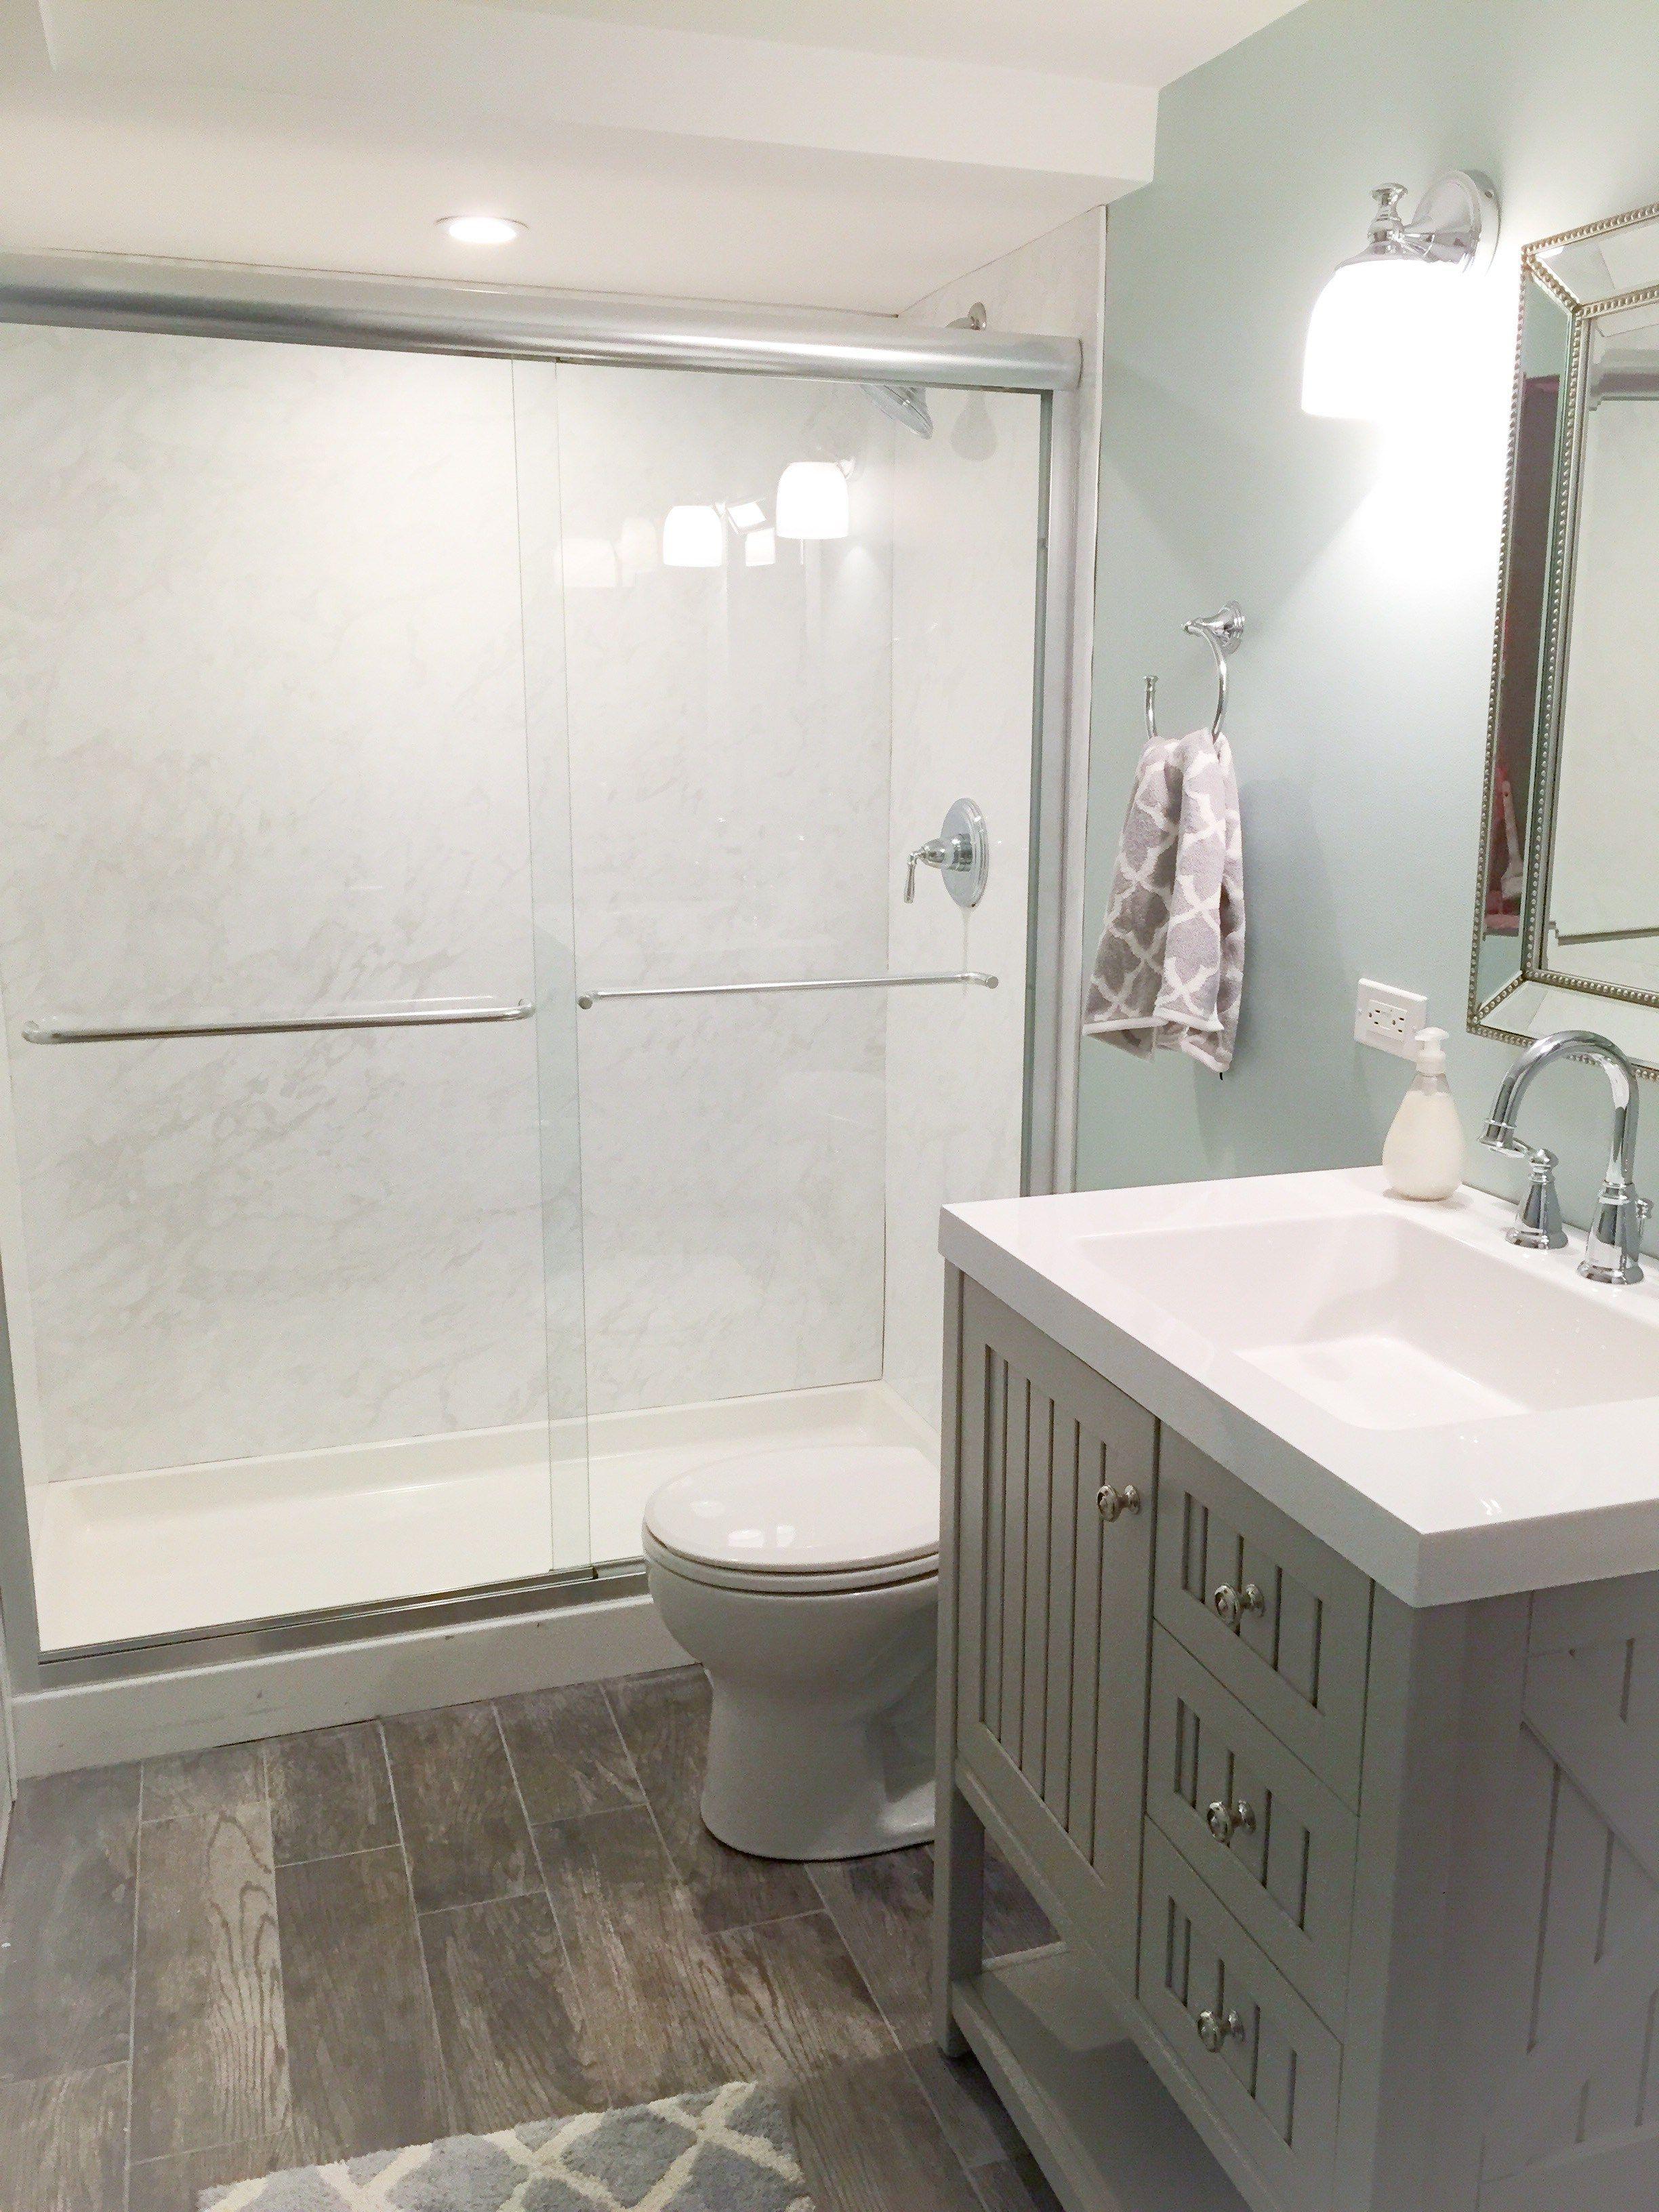 All Details You Need To Know About Home Decoration In 2020 Badezimmer Klein Badezimmer Komplett Kleines Bad Umbau